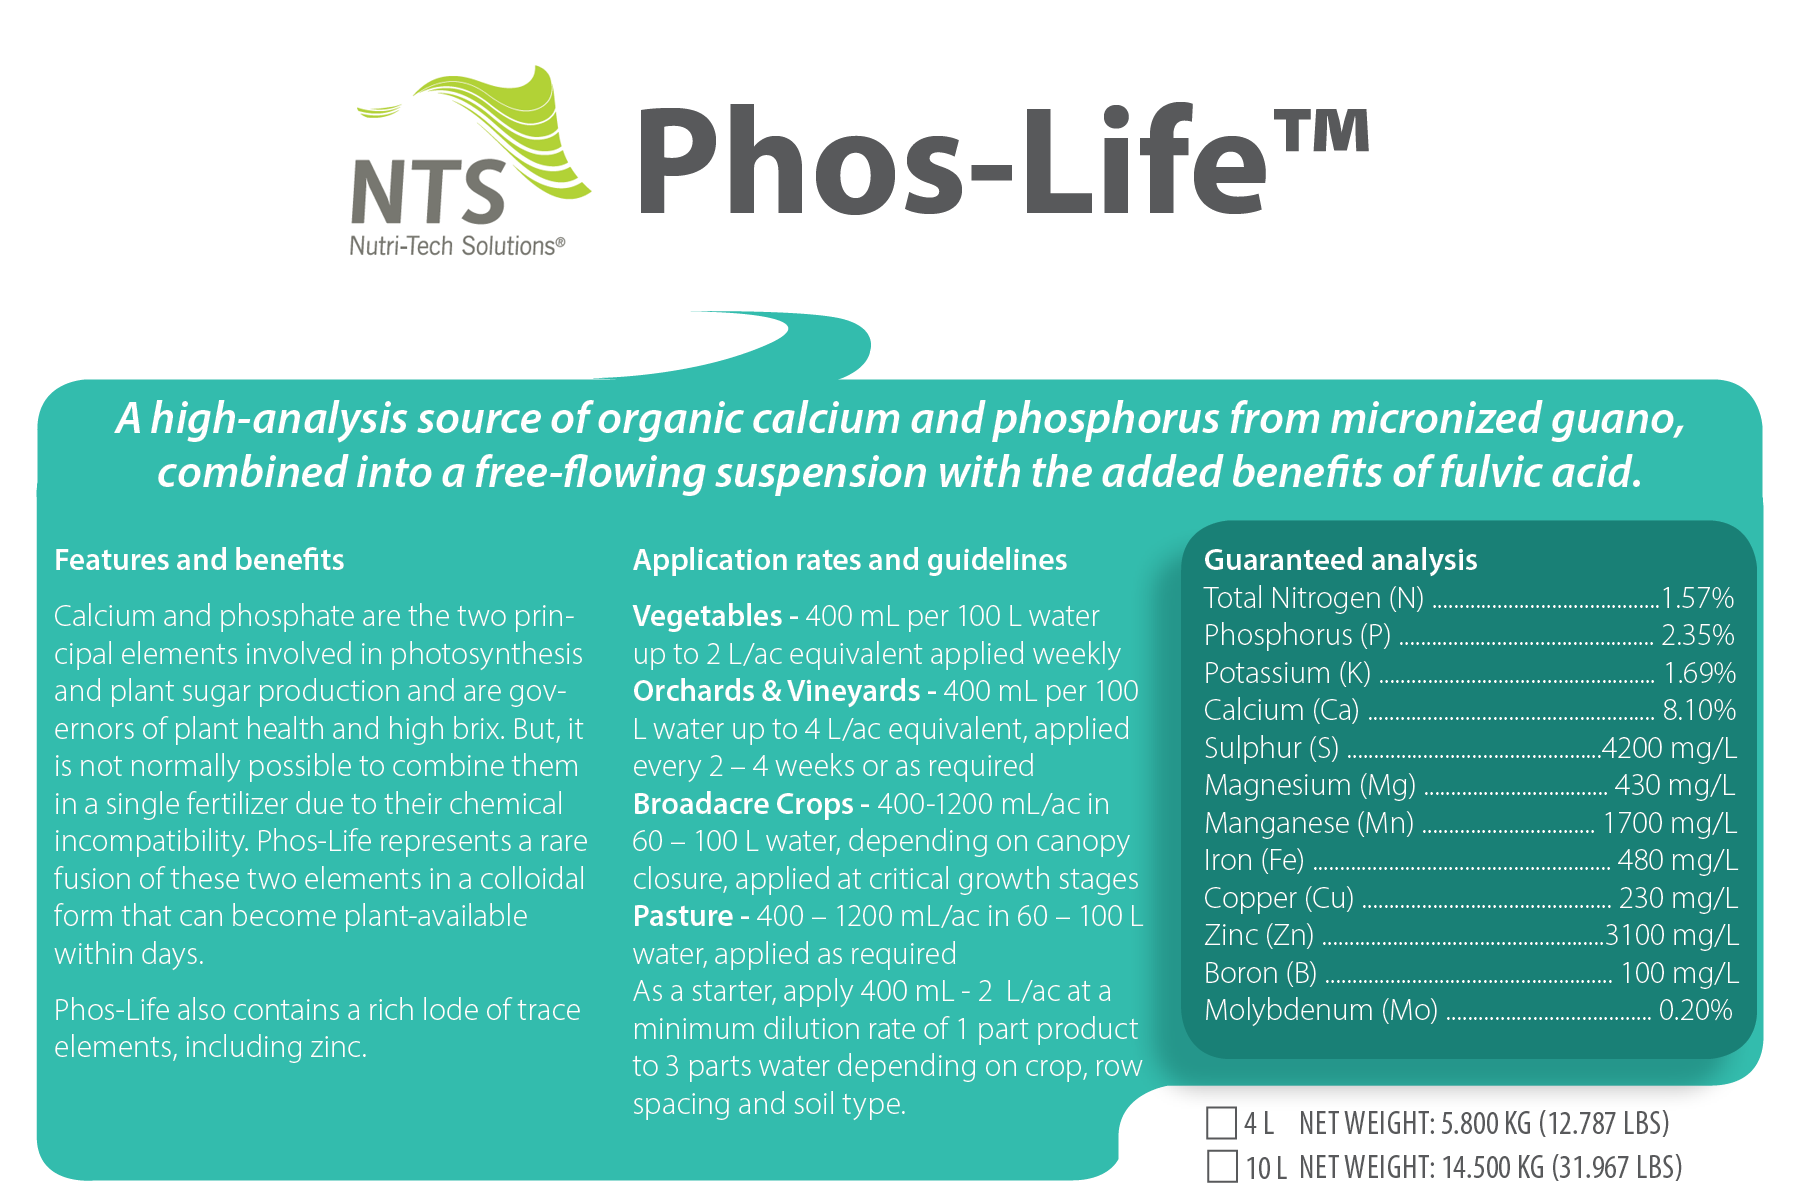 NTS Phos-Life™ store